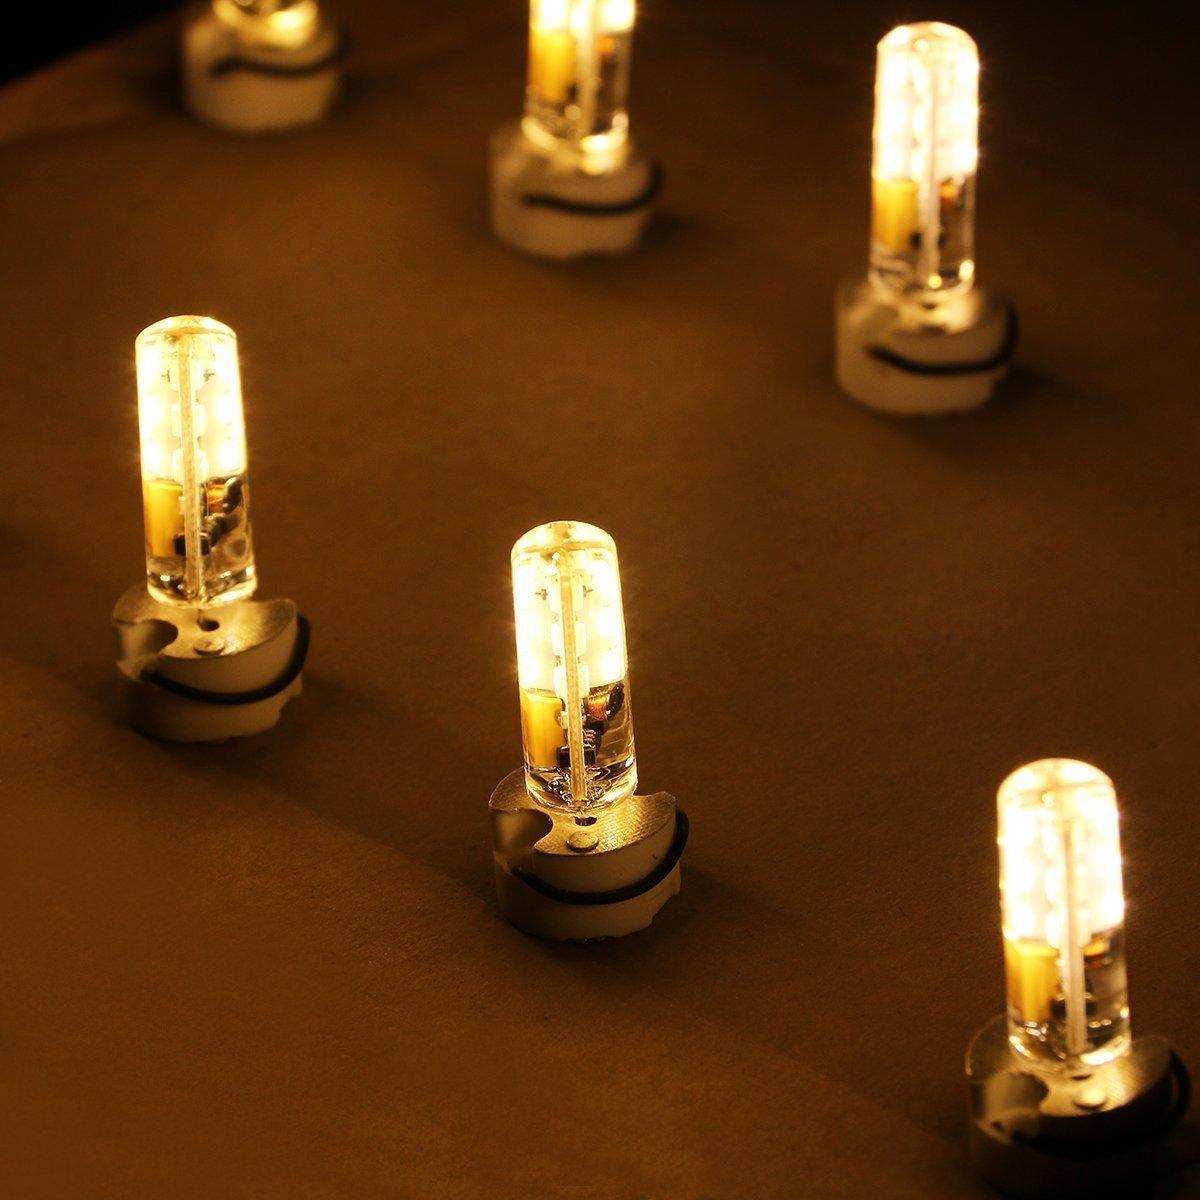 AveyLum 2.5W G4 LED Lampen Warmweiß, Ersatz für 20W Halogenlampen, 180lm, 3000K, 2835 SMD Kieselgel LED Dekorative Kronleuchter Beleuchtung, LED Birnen, LED Leuchtmittel, AC/DC 12V, 10er Pack